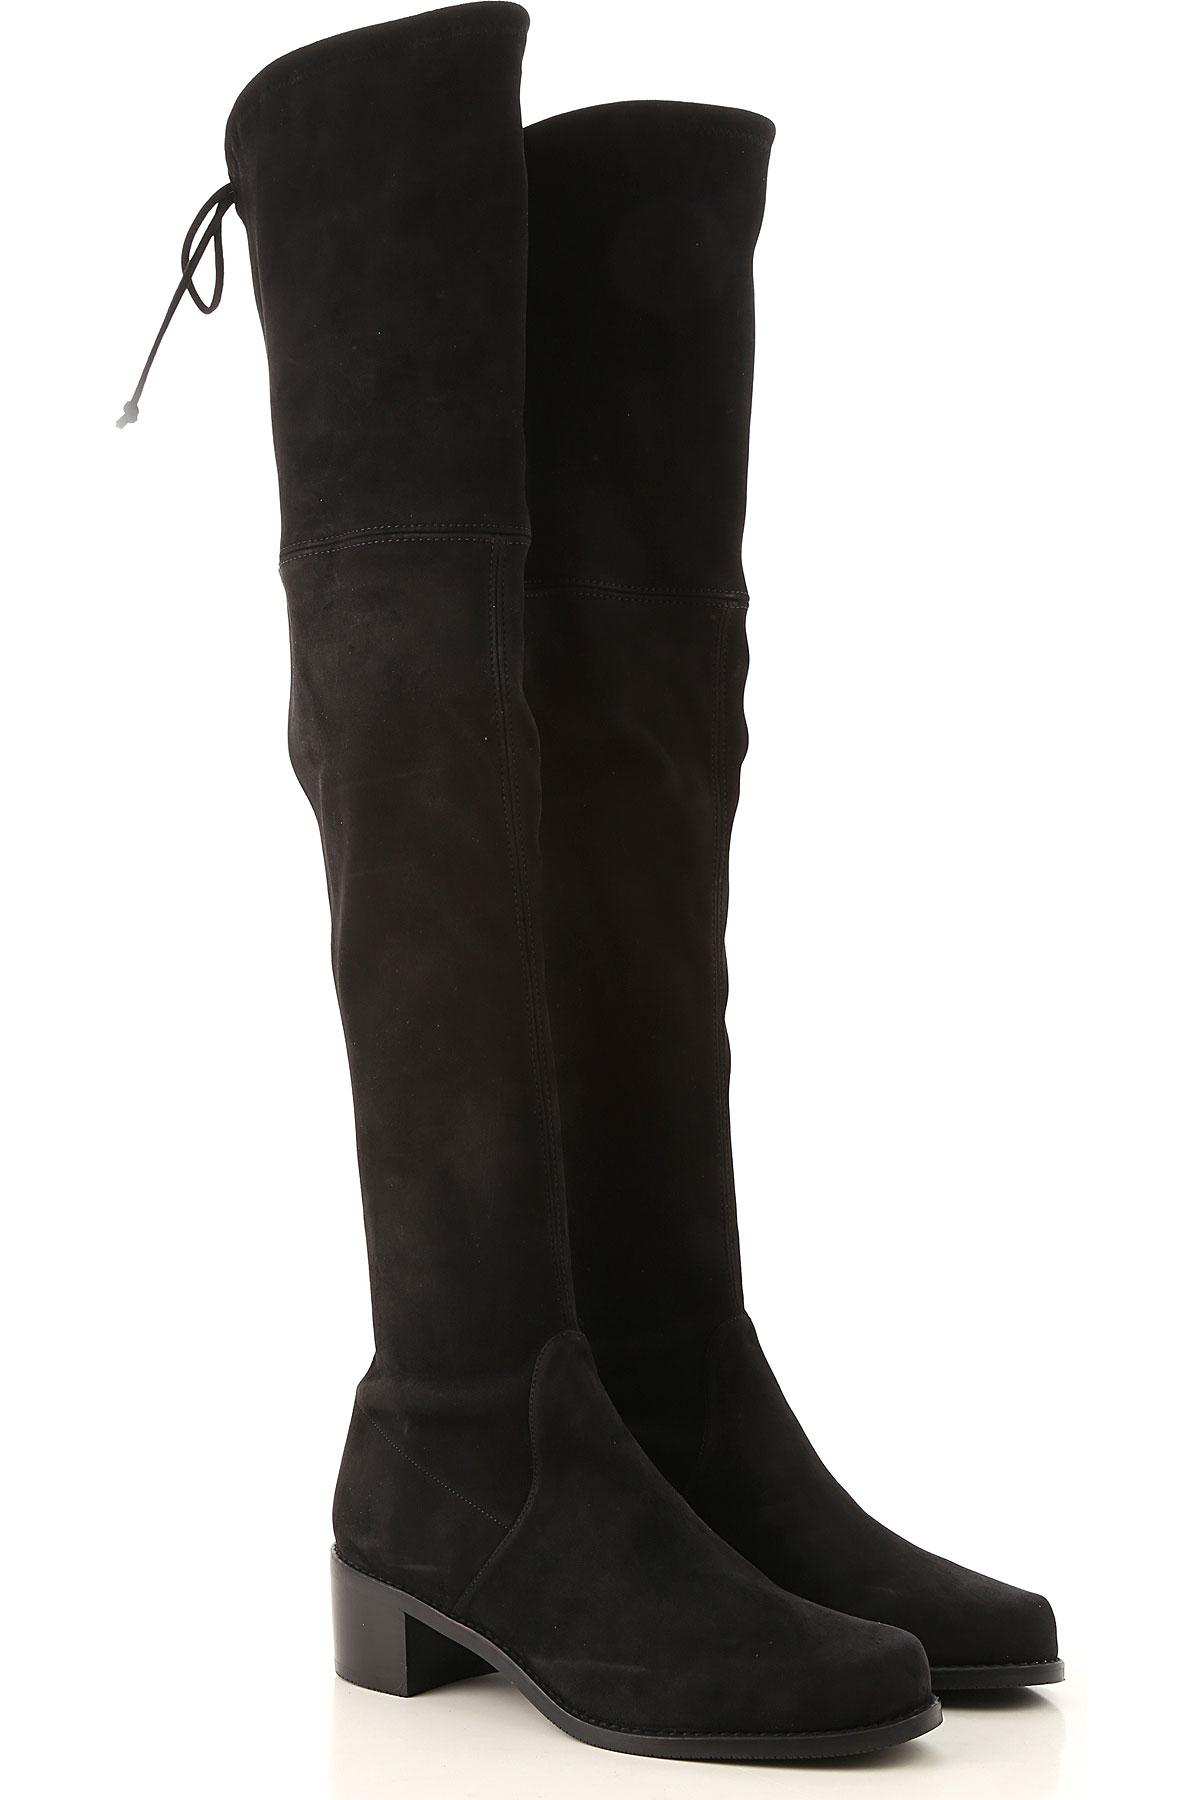 Stuart Weitzman Boots For Women, Booties On Sale, Black, Suede Leather, 2019, Us 6 (Eu 36.5) Us 4.5 ( Eu 35) Us 7.5  (Eu 38) Us 6.5 (Eu 37) Us 5.5 (Eu 36) Us 5 (Eu 35.5) Us 7 (Eu 37.5)